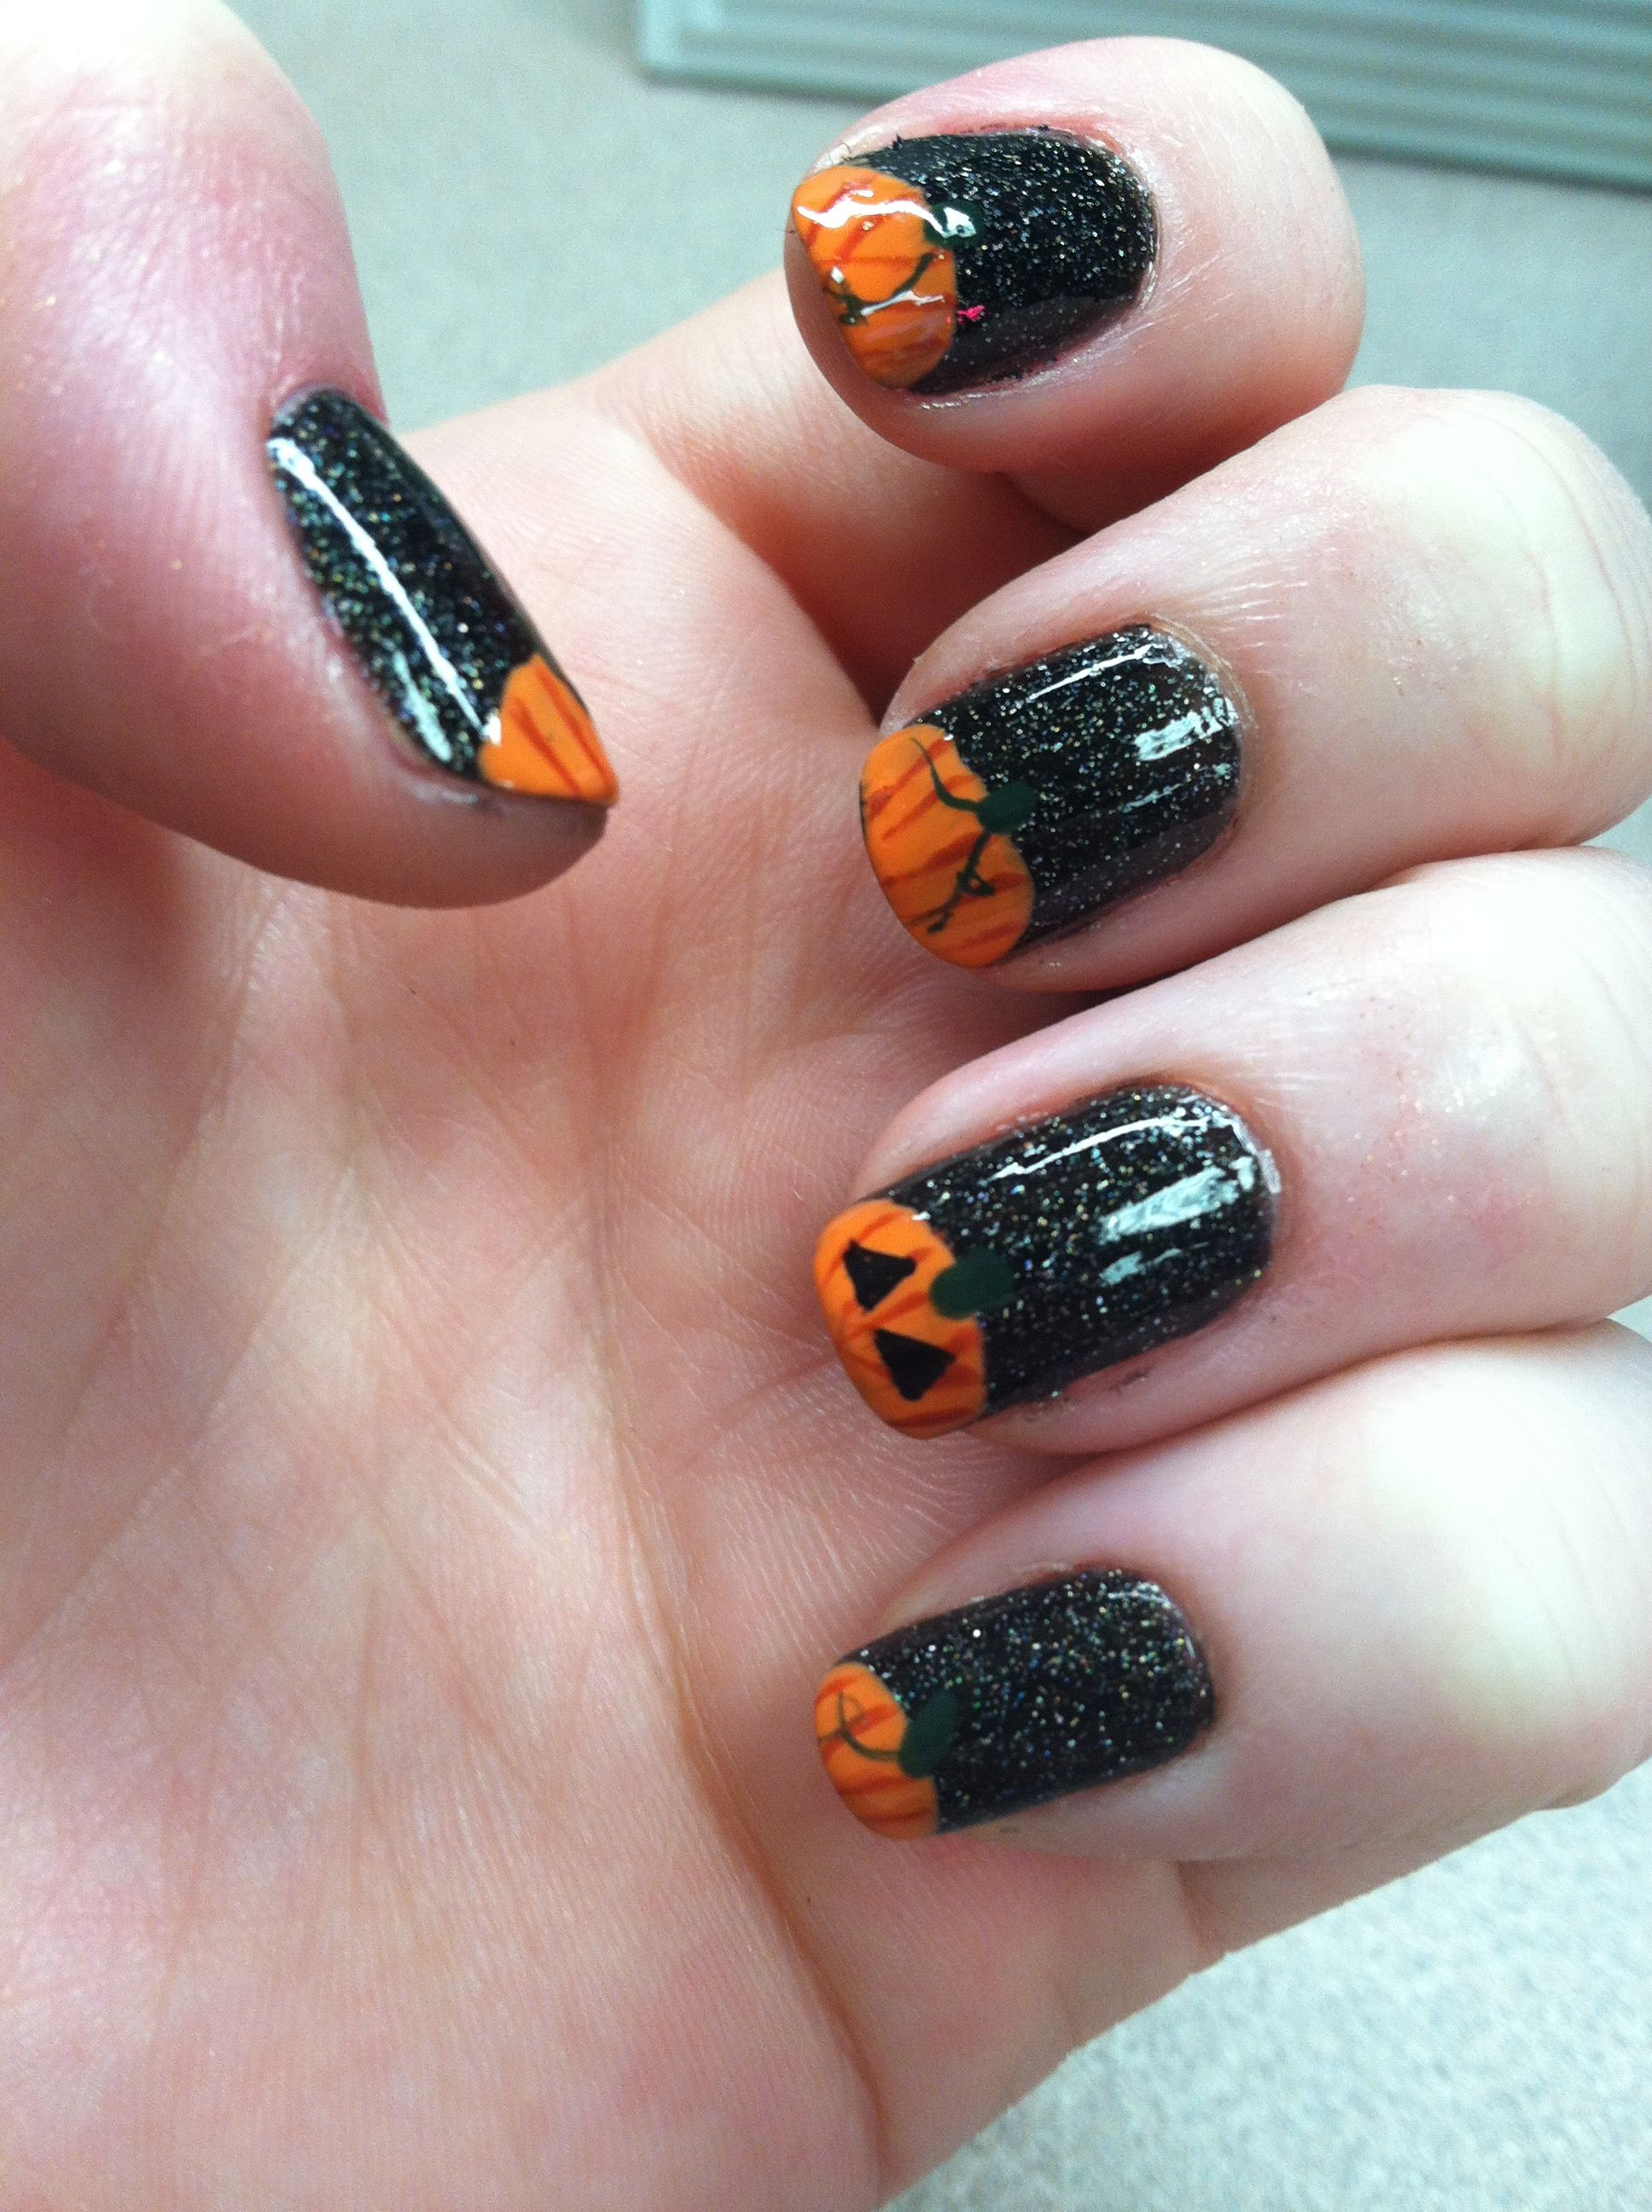 Halloween nails. Zoya storm (glittery black) with orange ...